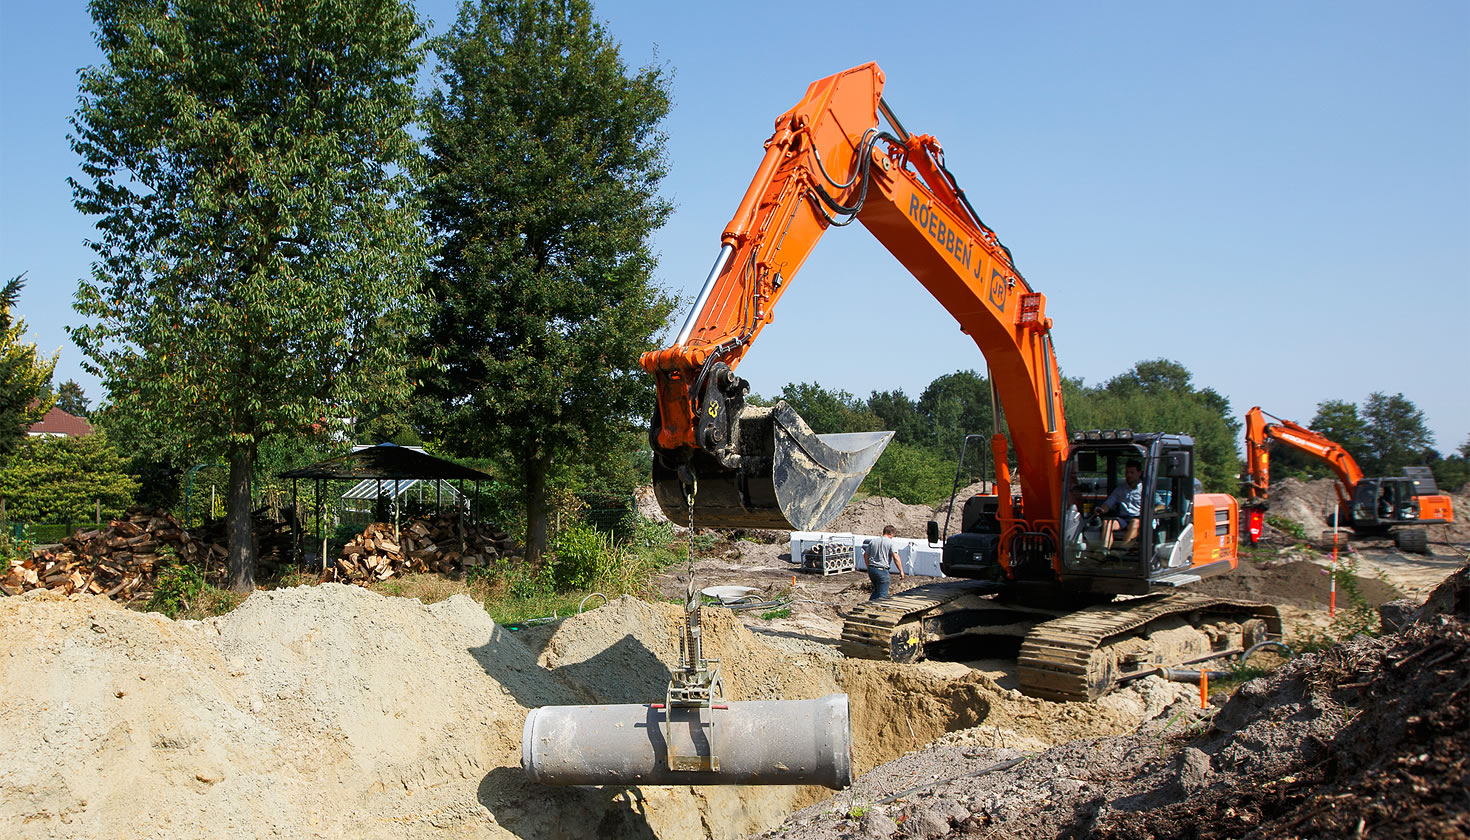 The first Hitachi ZX290LC-5 excavator in Belgium